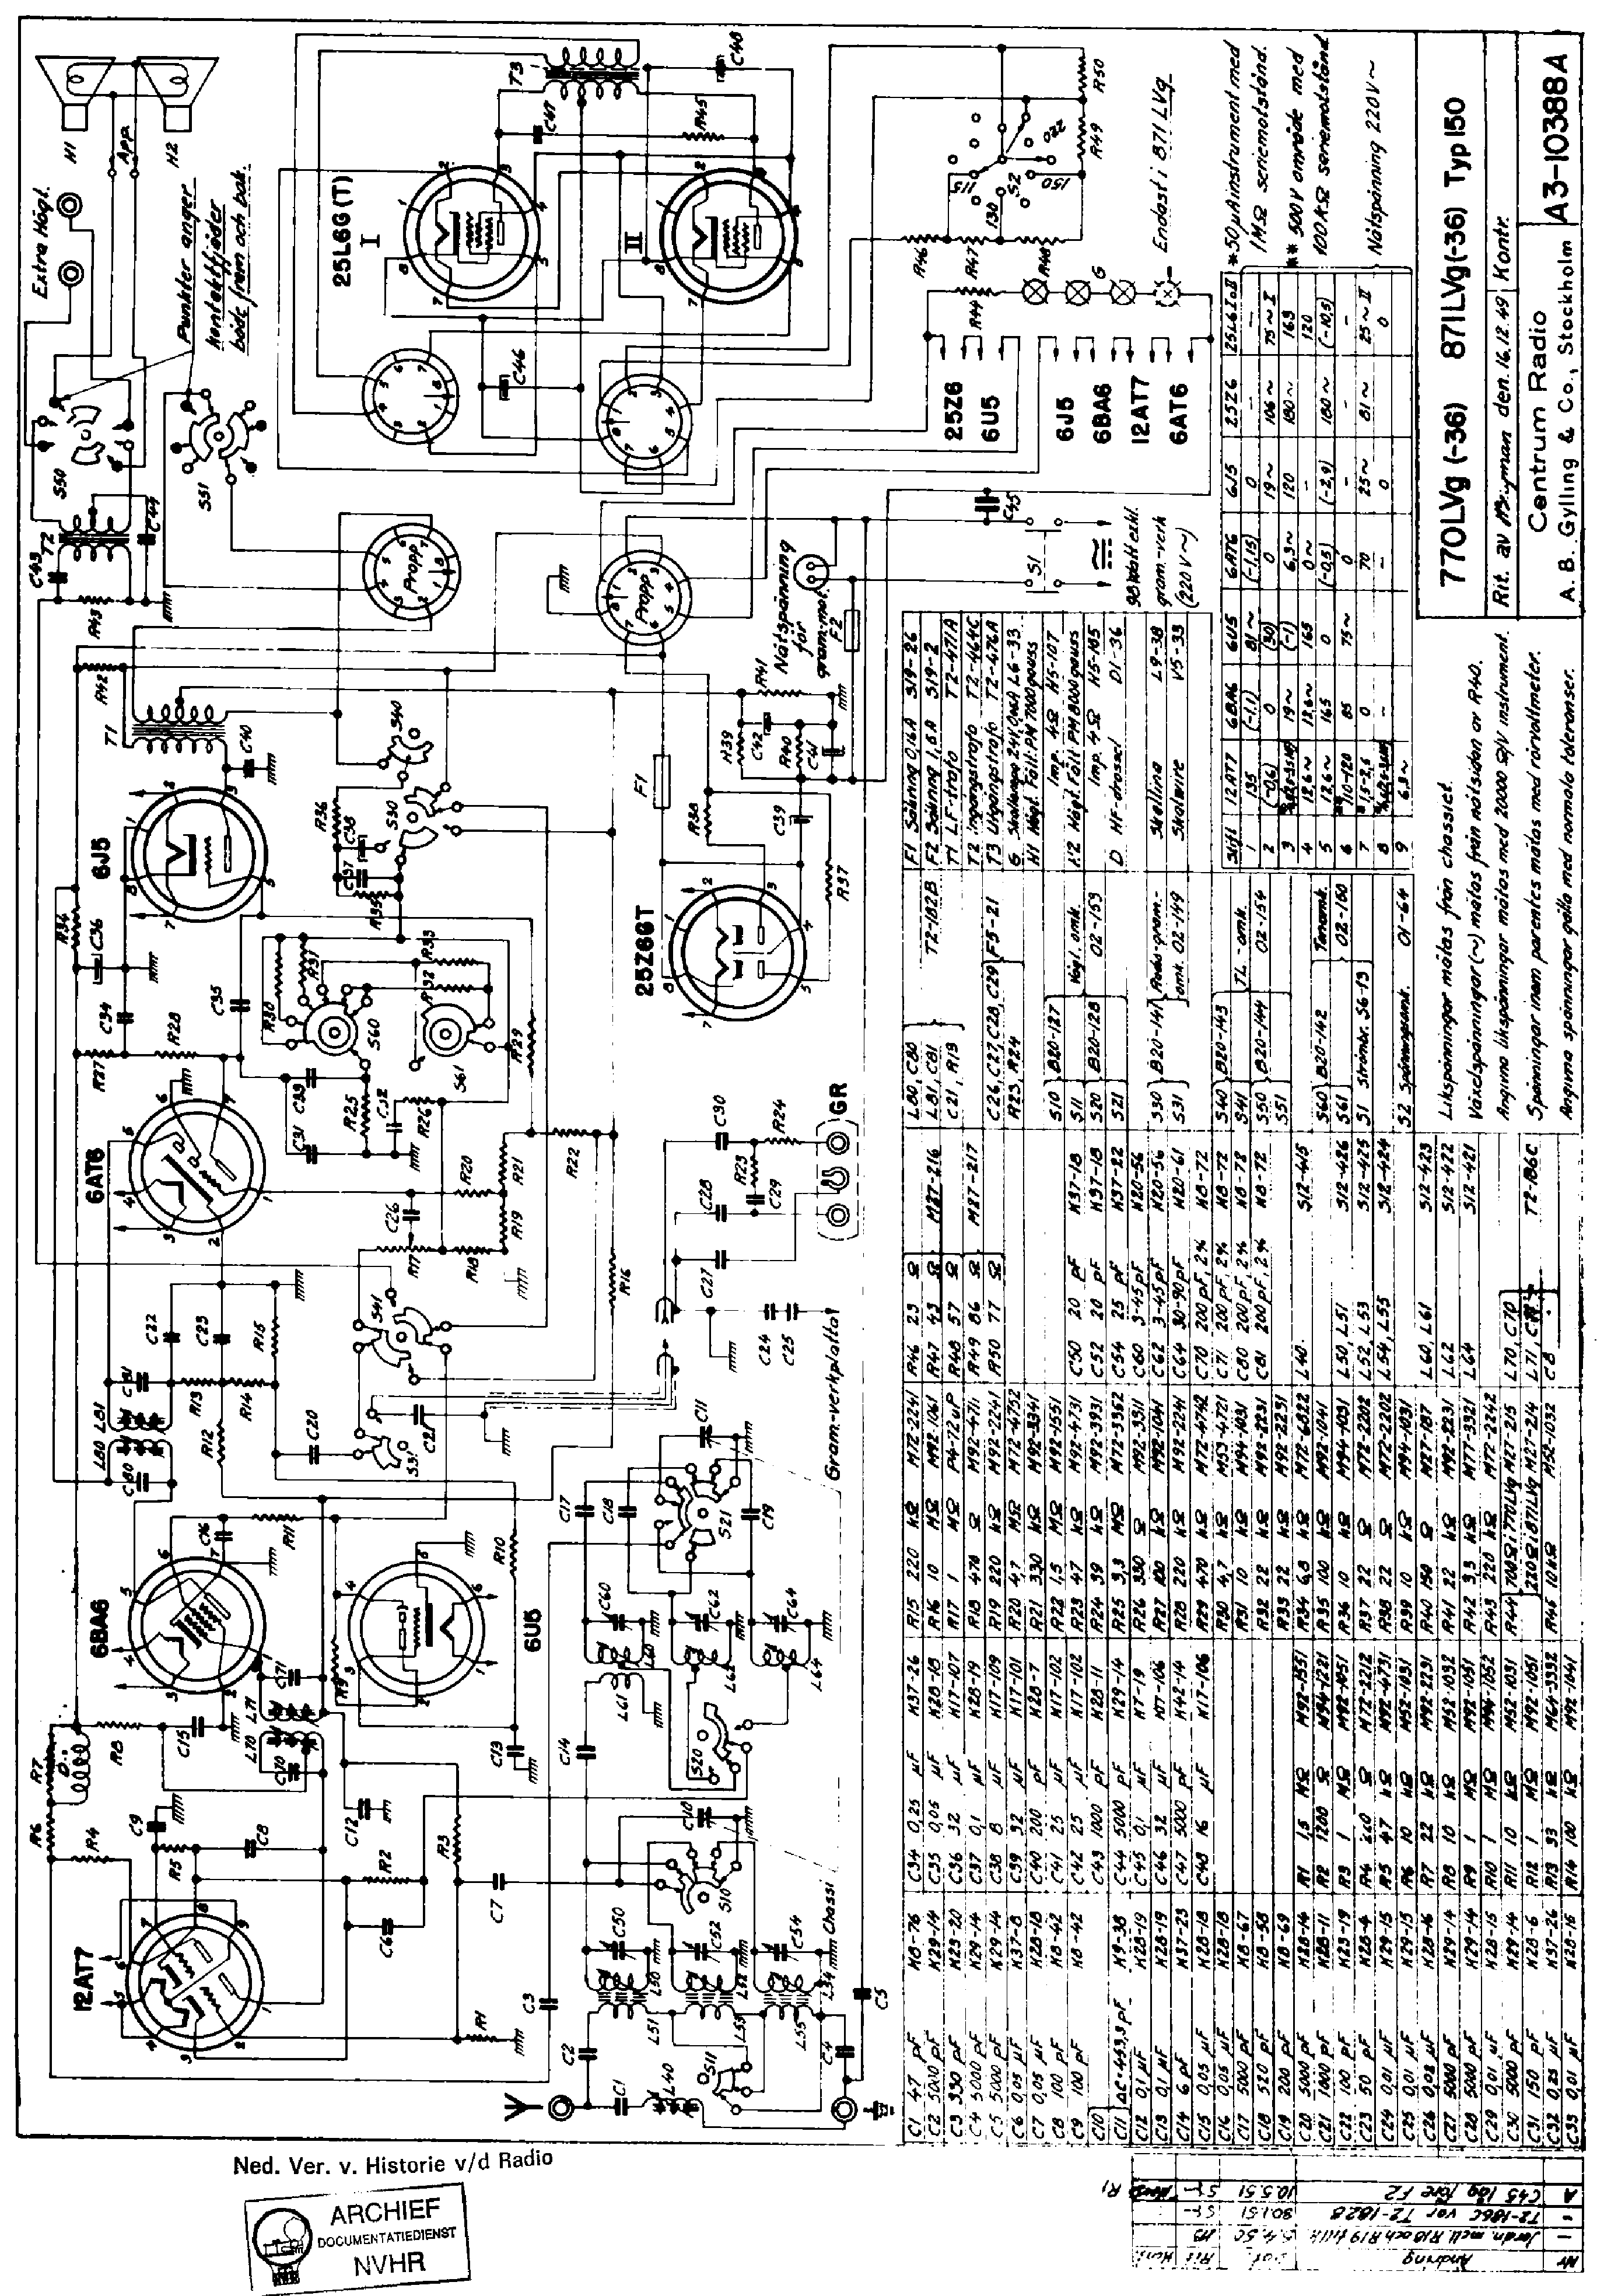 CENTRUM 770LV-G36 871LVG-36 TYP150 RECEIVER 1949 SCH Service Manual